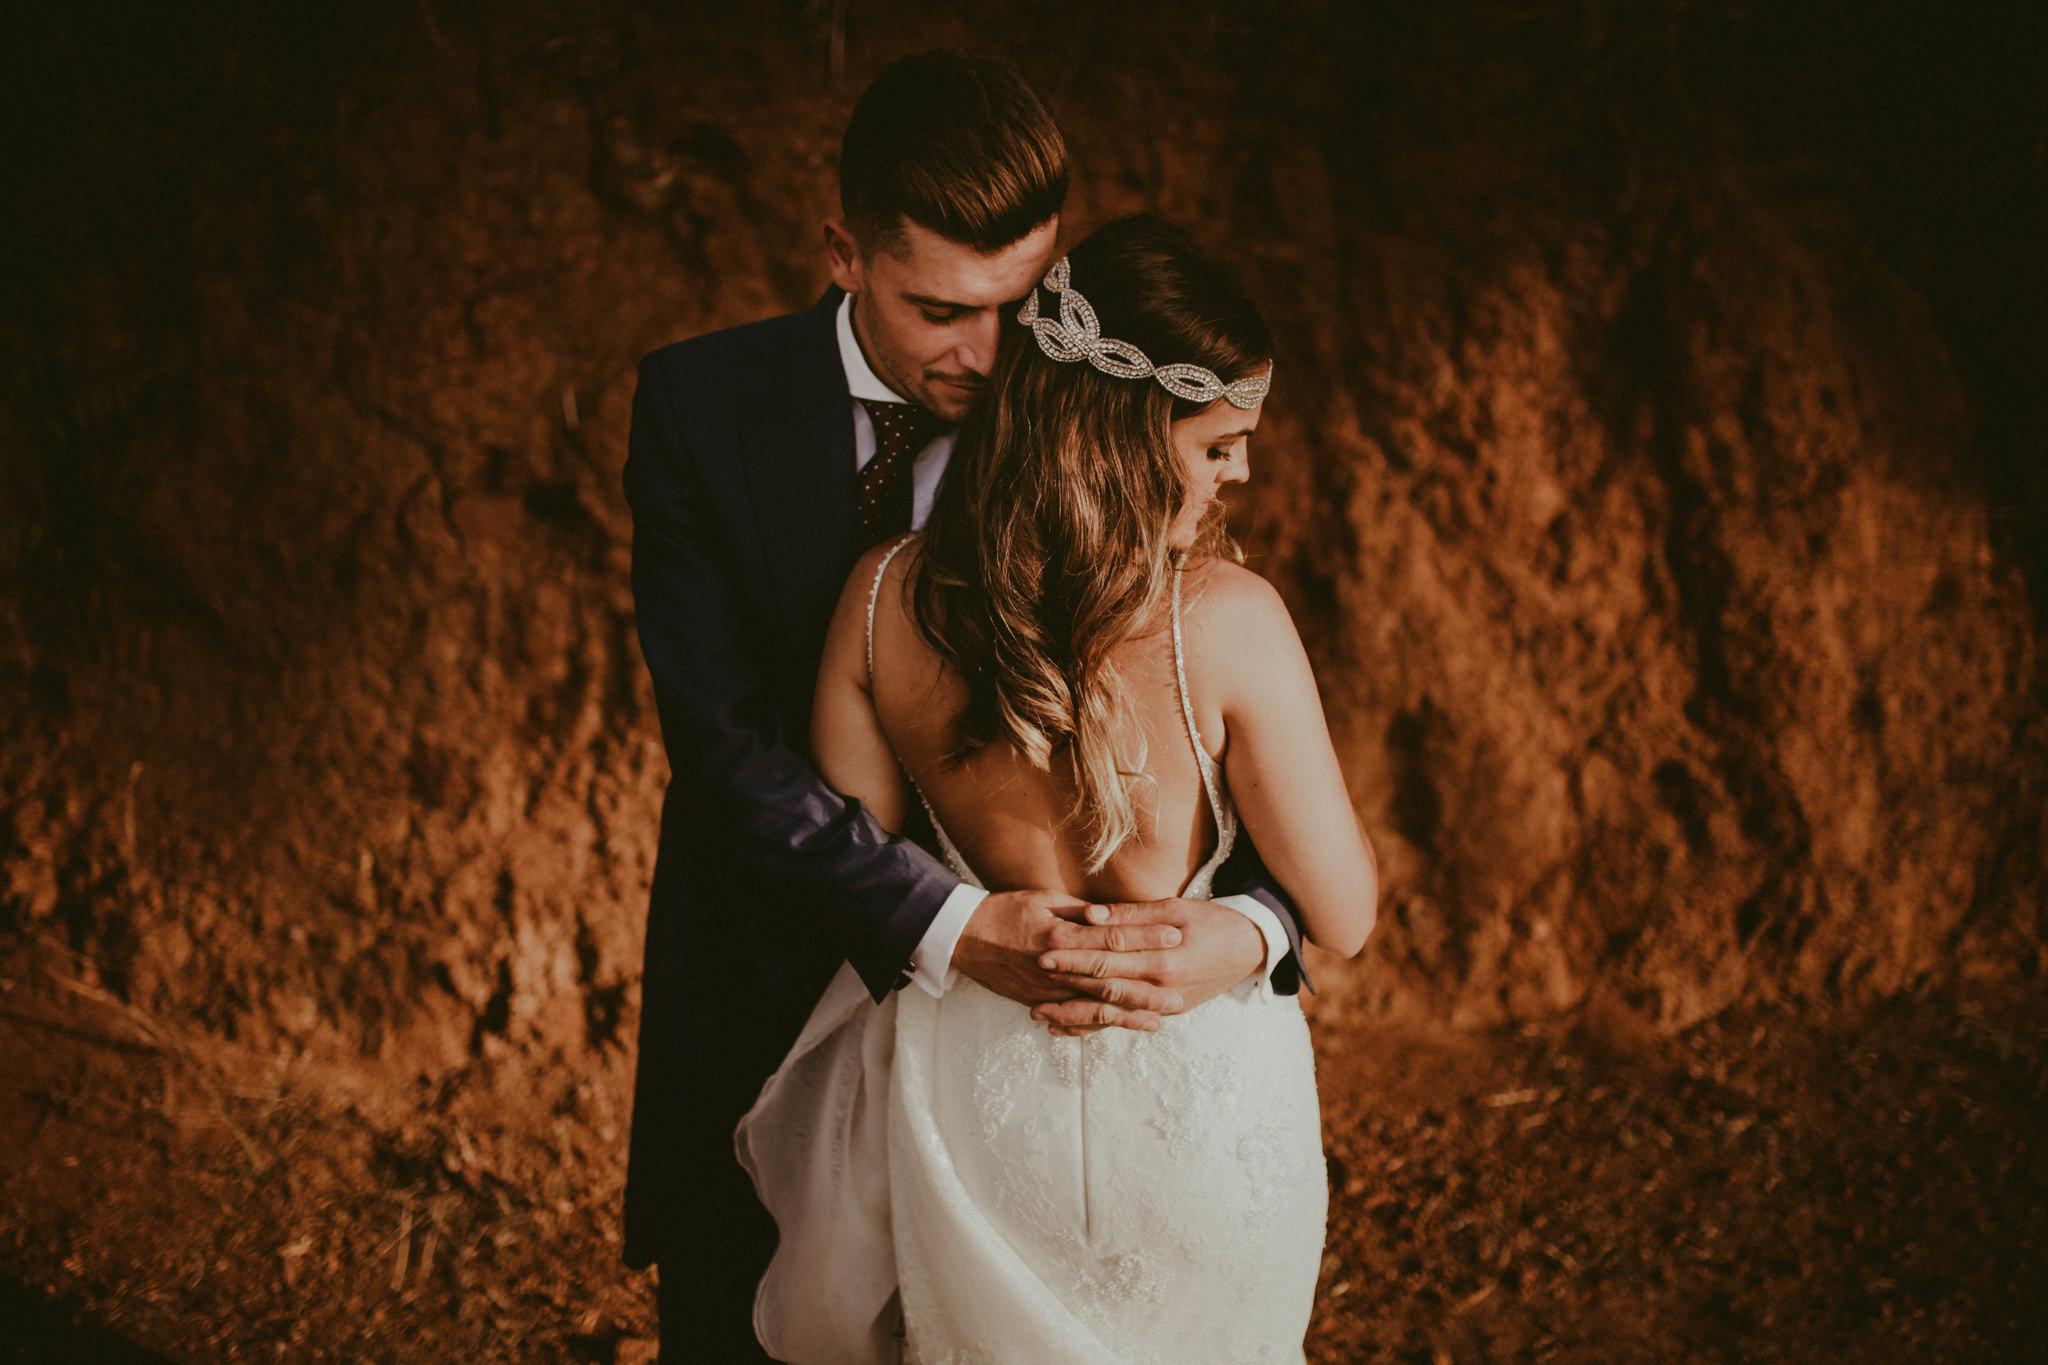 boda-diferente-fotografo-boda-laspalmas-grancanaria-68